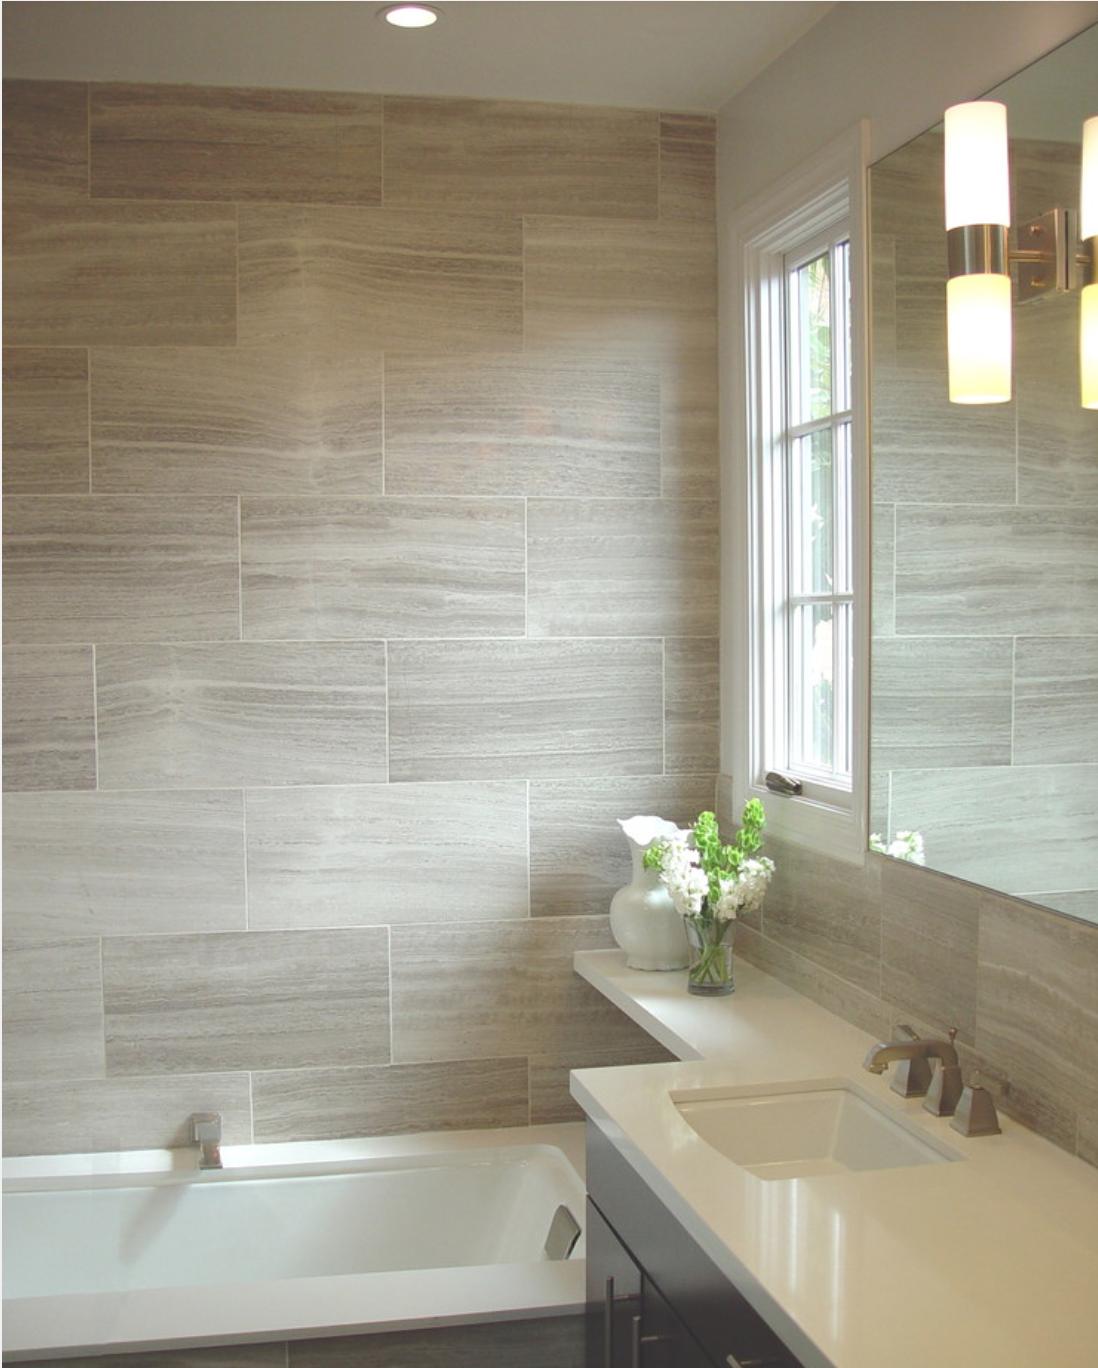 stone tile at baths? | Debbie | Pinterest | Stone tiles, Bath and ...